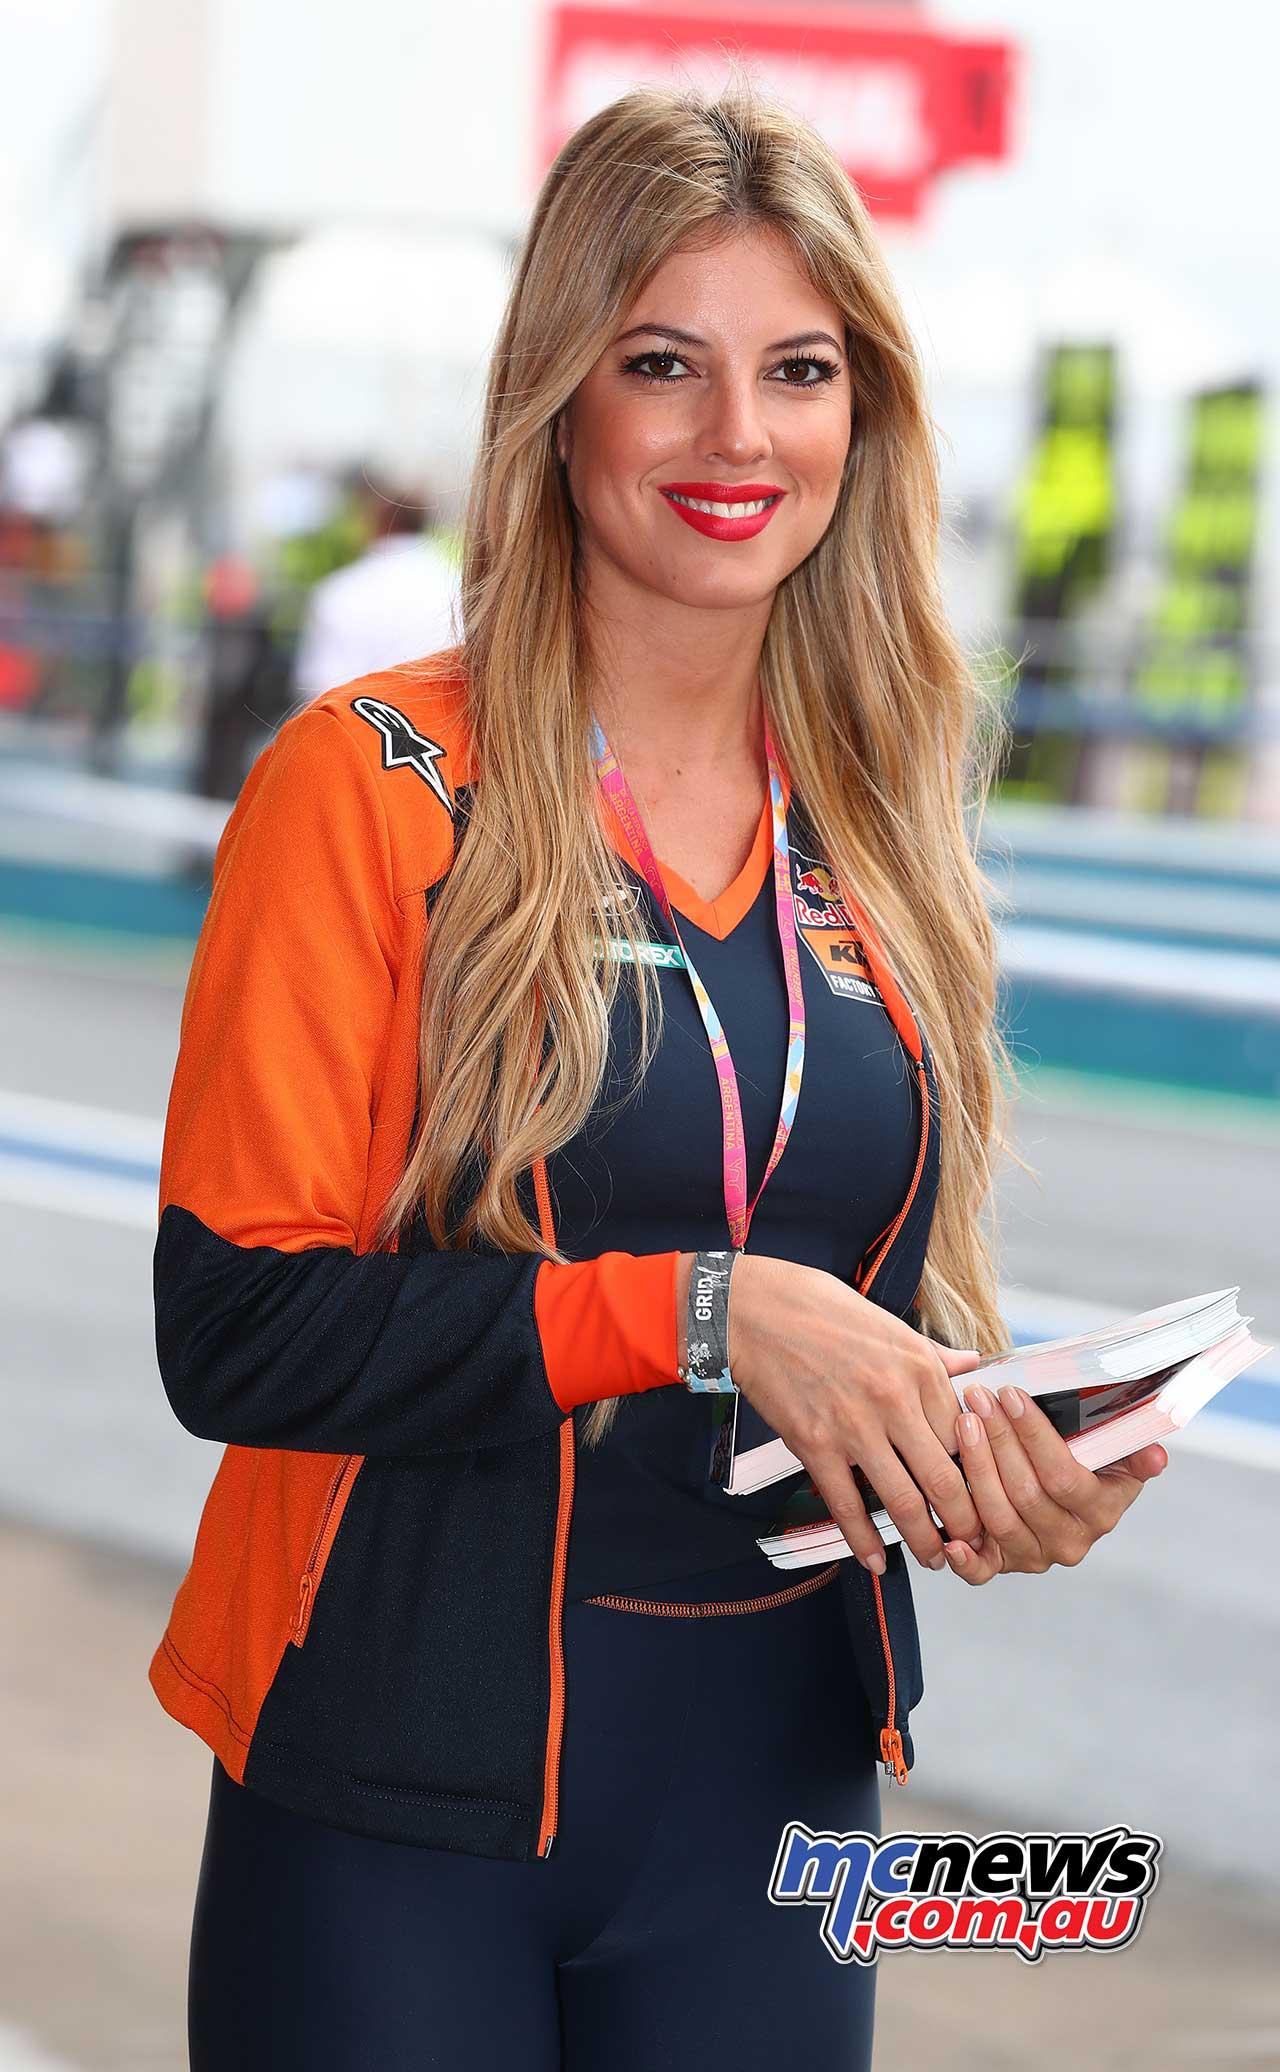 2018 Argentina MotoGP Grid Girls | MCNews.com.au